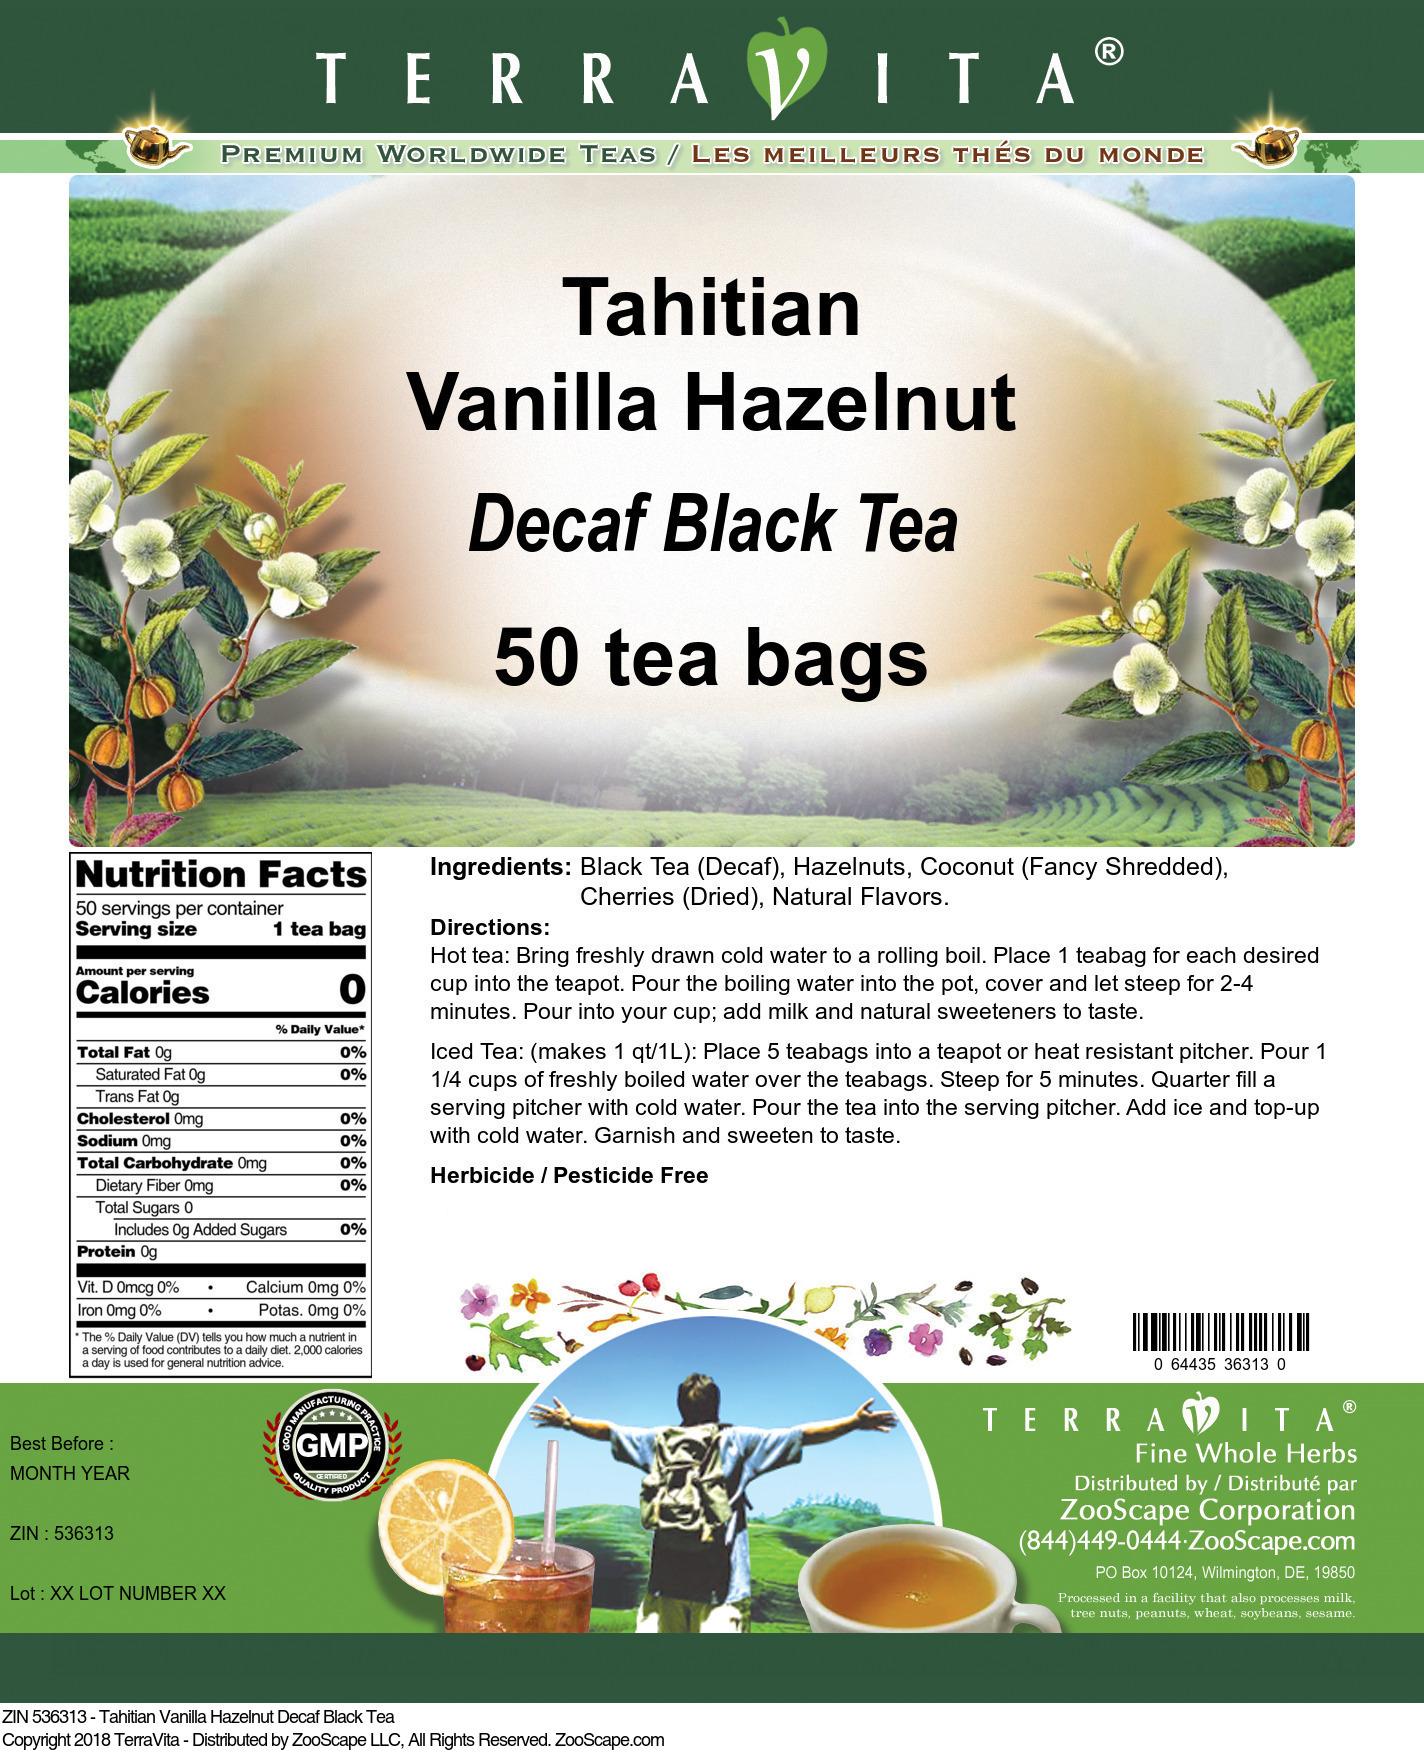 Tahitian Vanilla Hazelnut Decaf Black Tea